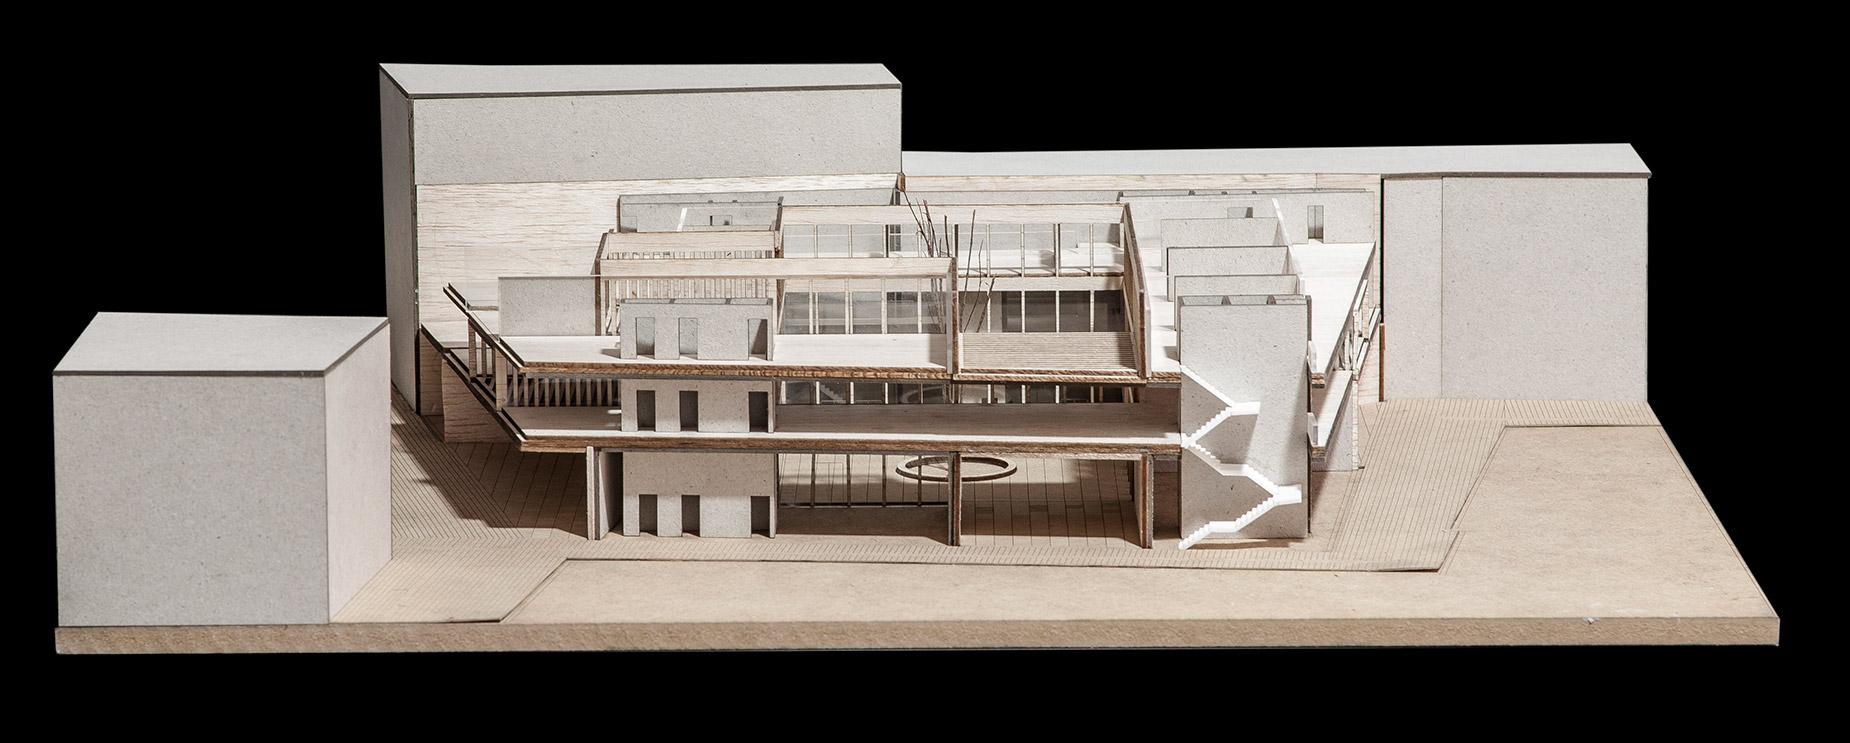 maqueta-arquitectura-architecture model-valencia-maqueta pfc-ETSAV-Biblioteca-arquimaqueta (5)